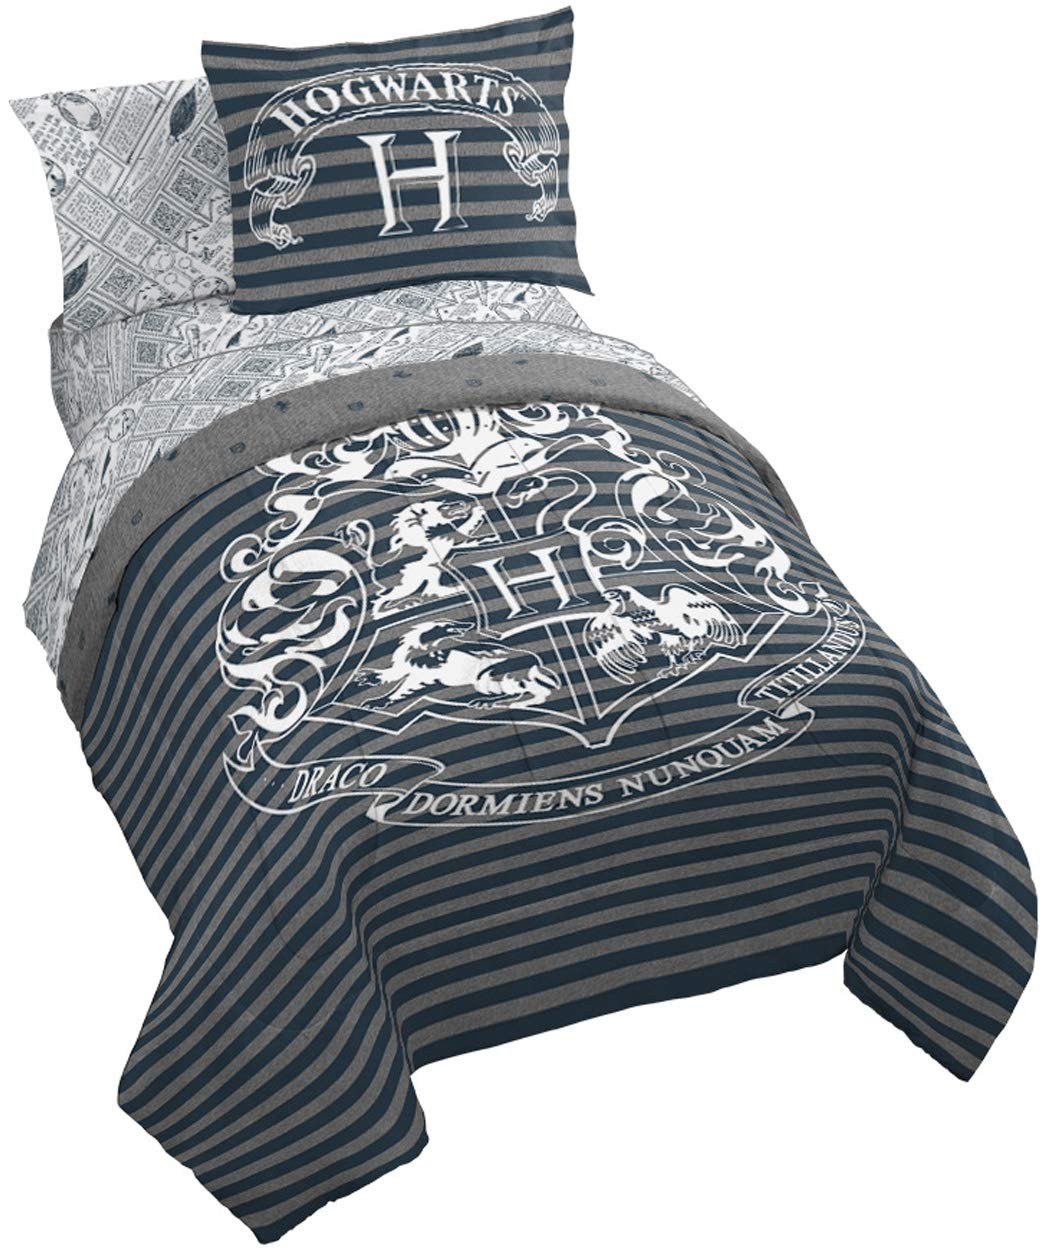 Jay Franco Harry Potter Draco Dormiens 7 Piece Queen Bed Set, Gray by Jay Franco